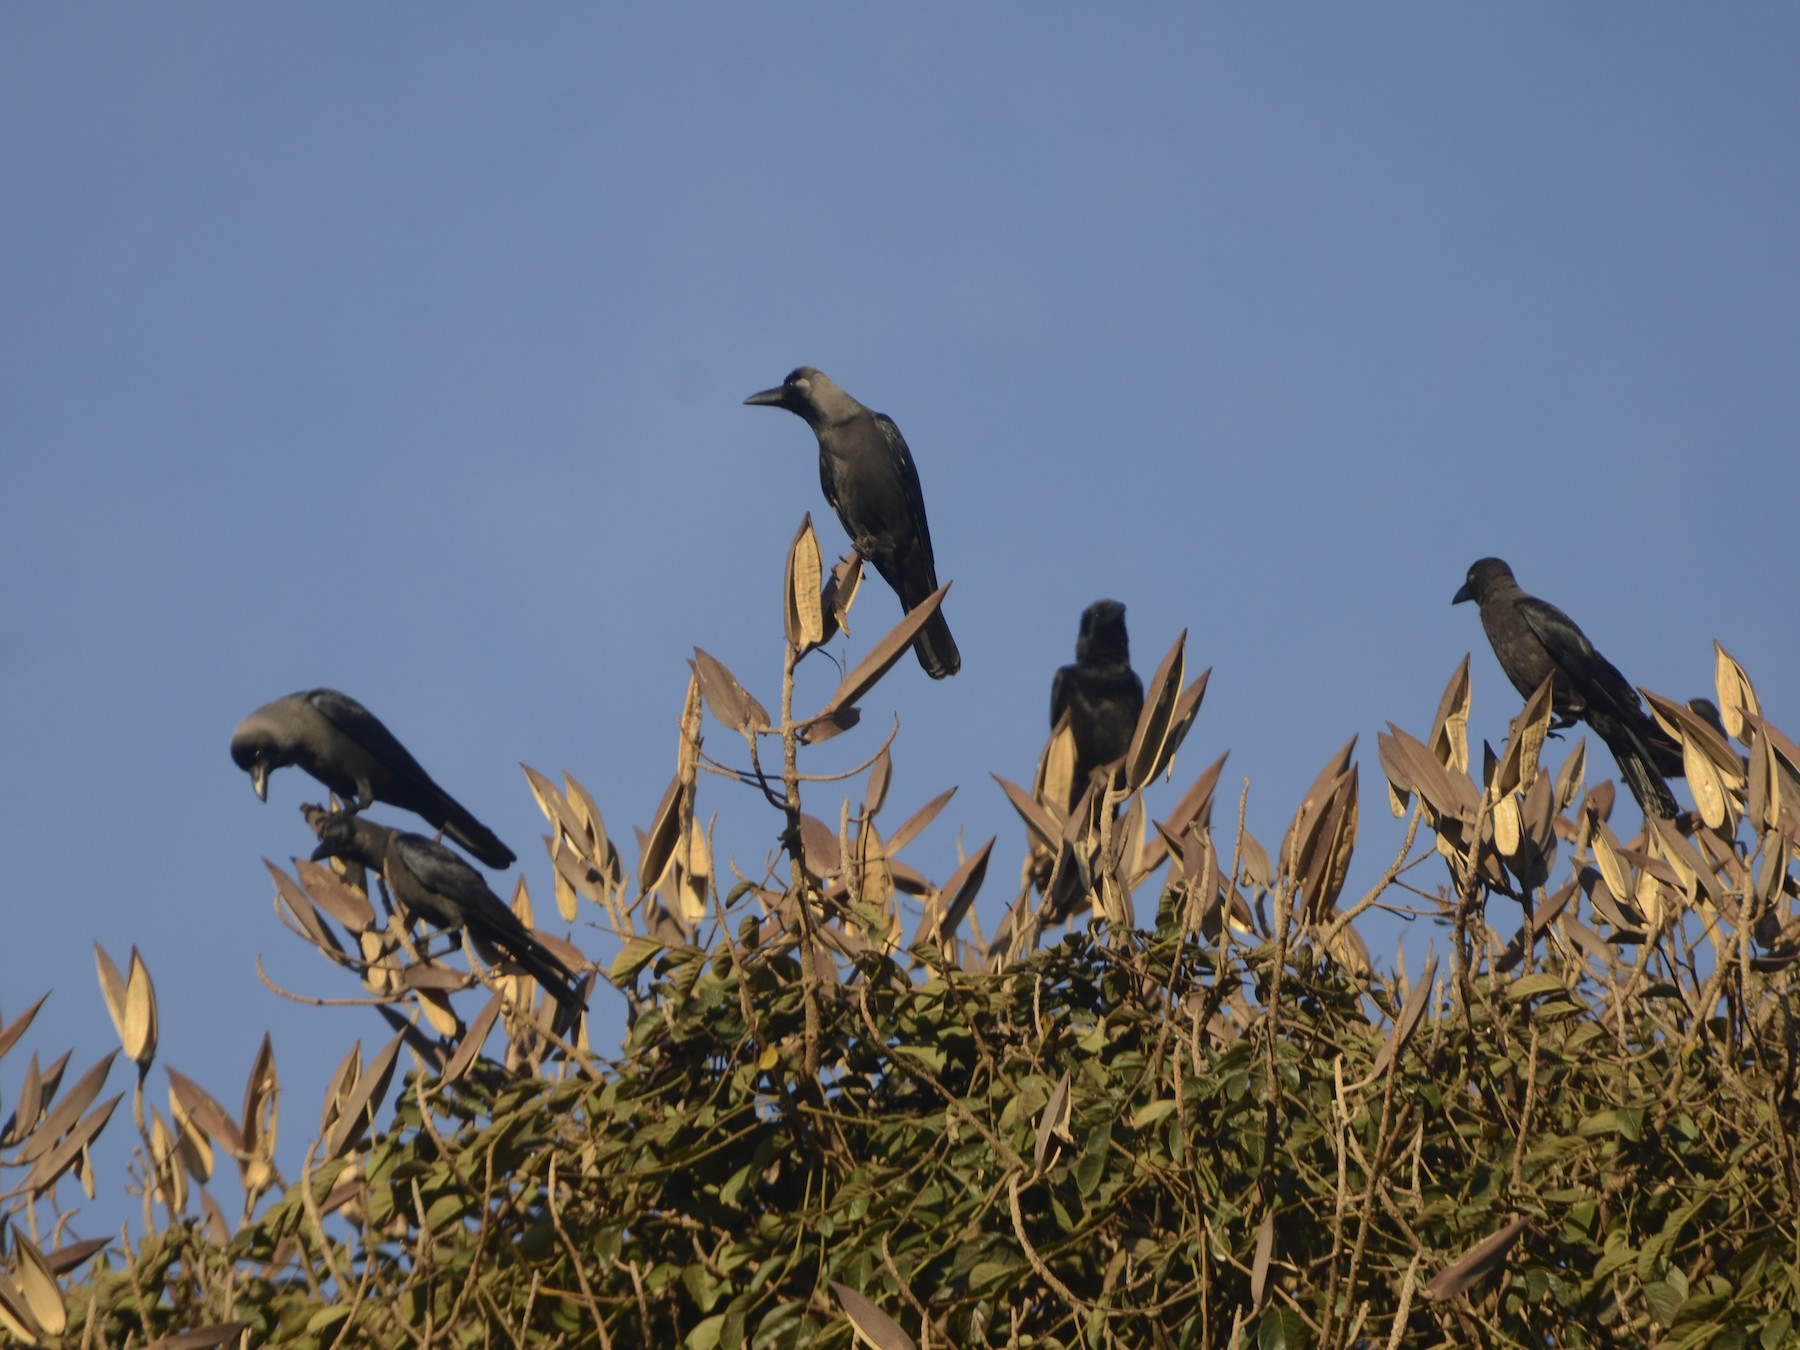 House Crow - Panchapakesan Jeganathan